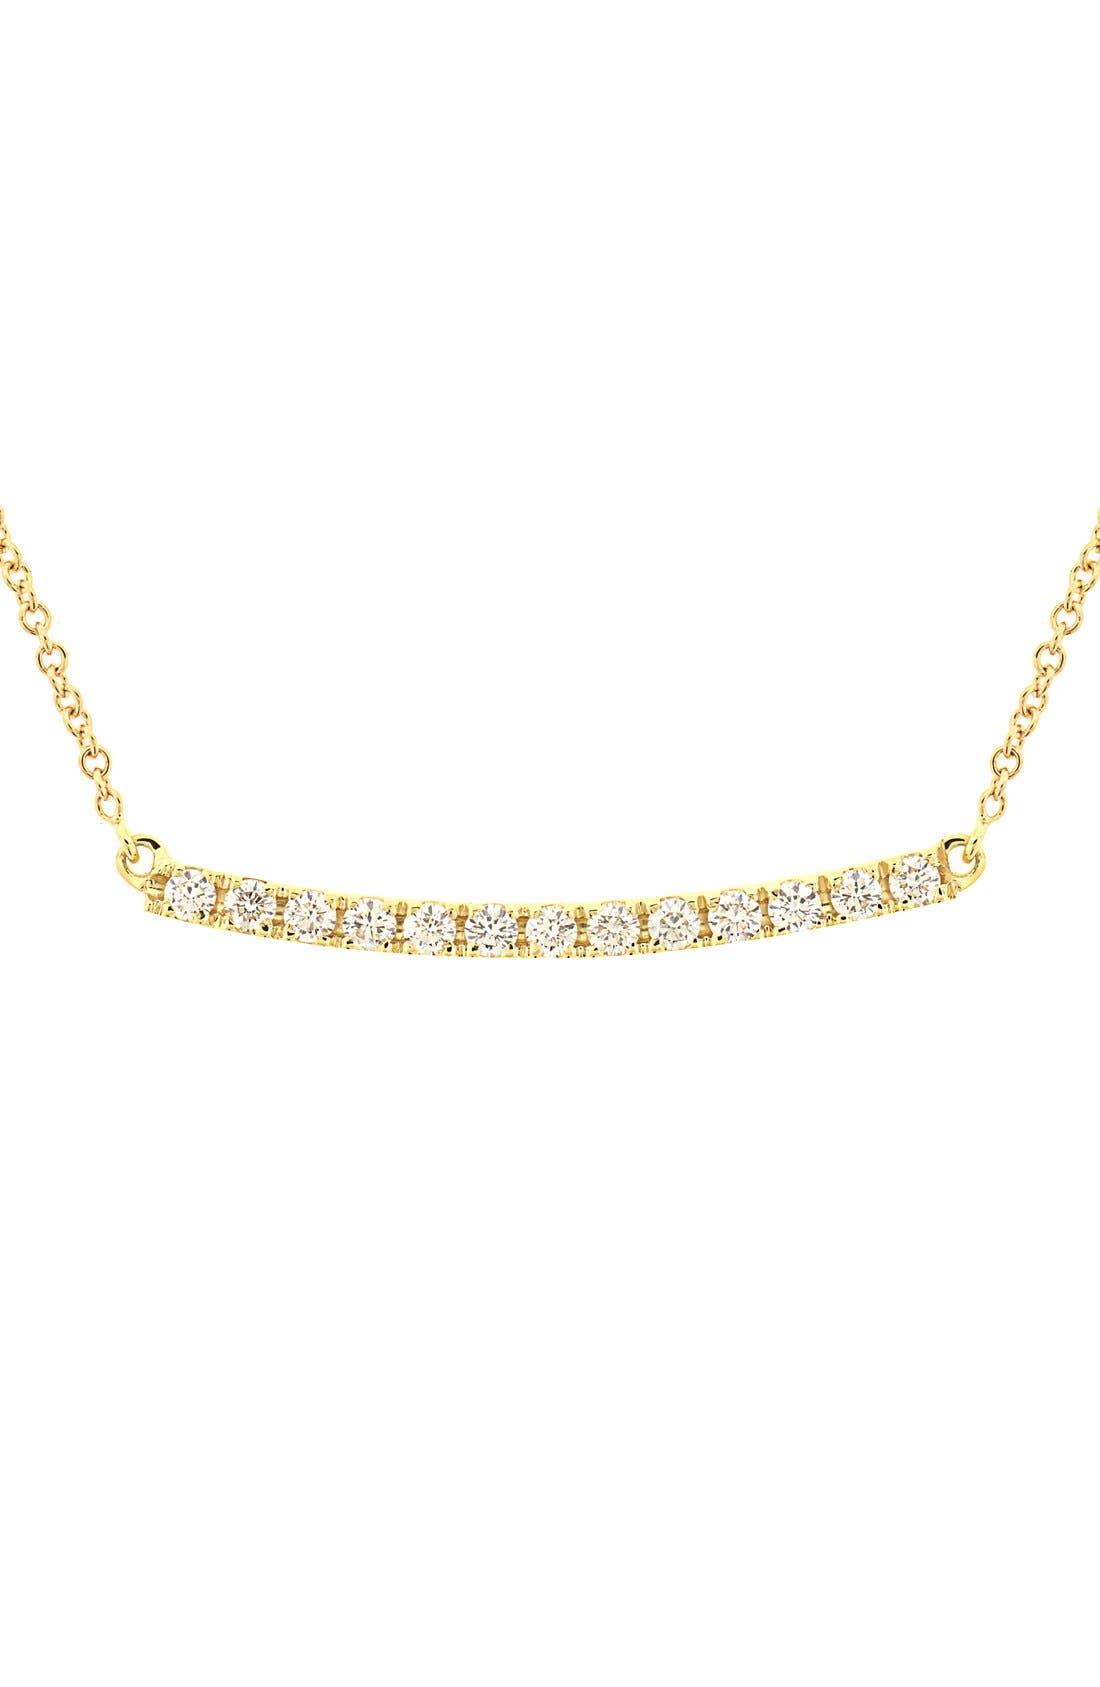 Stick Pavé Diamond Bar Necklace,                             Main thumbnail 1, color,                             YELLOW GOLD